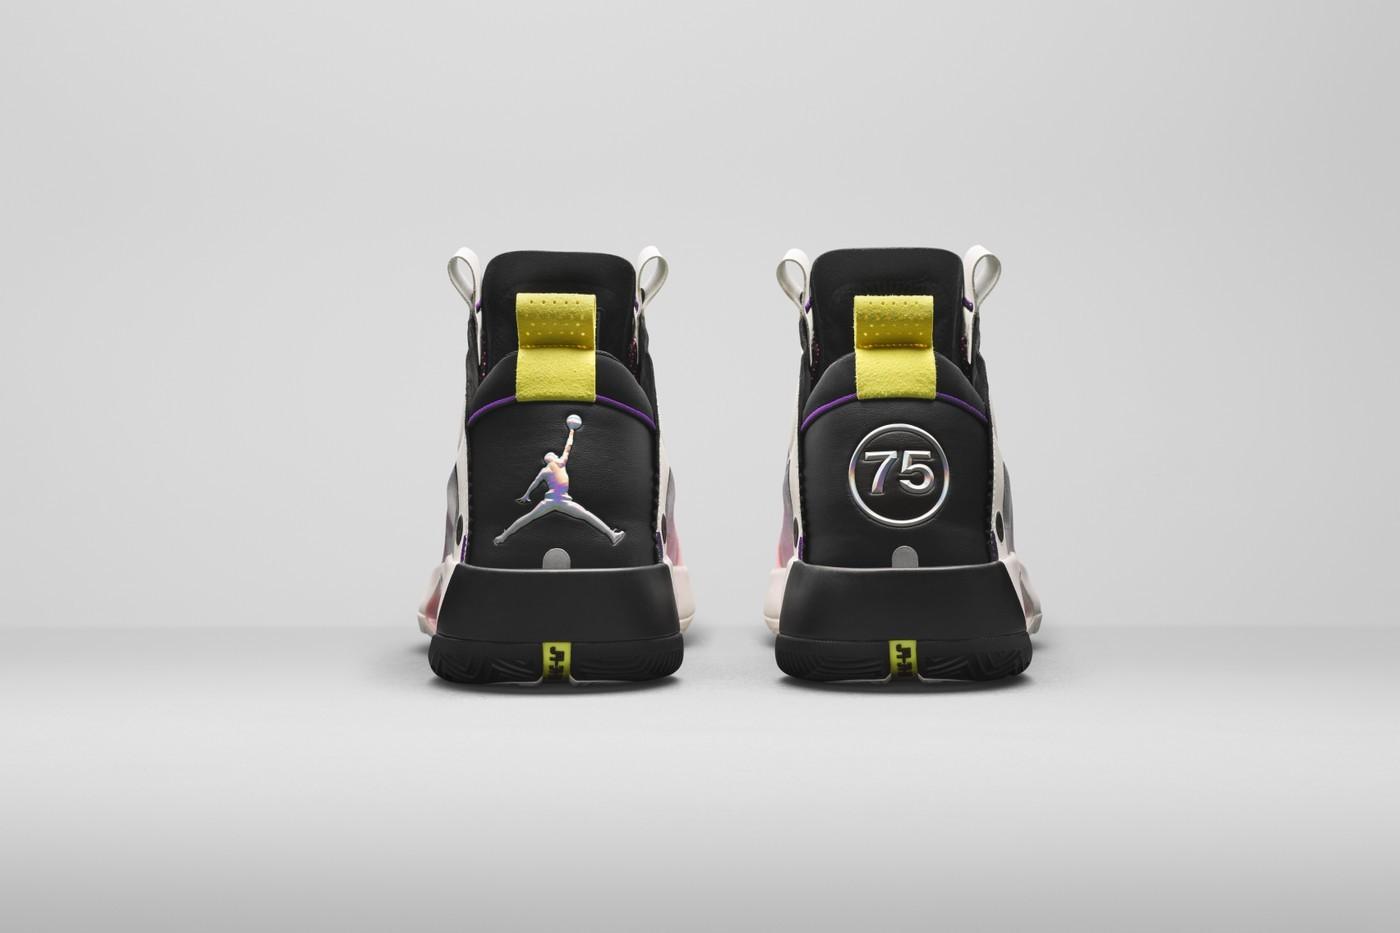 Air Jordan 34,AJ34 全球限量 500 双!这可能最美的一双 Air Jordan 34!